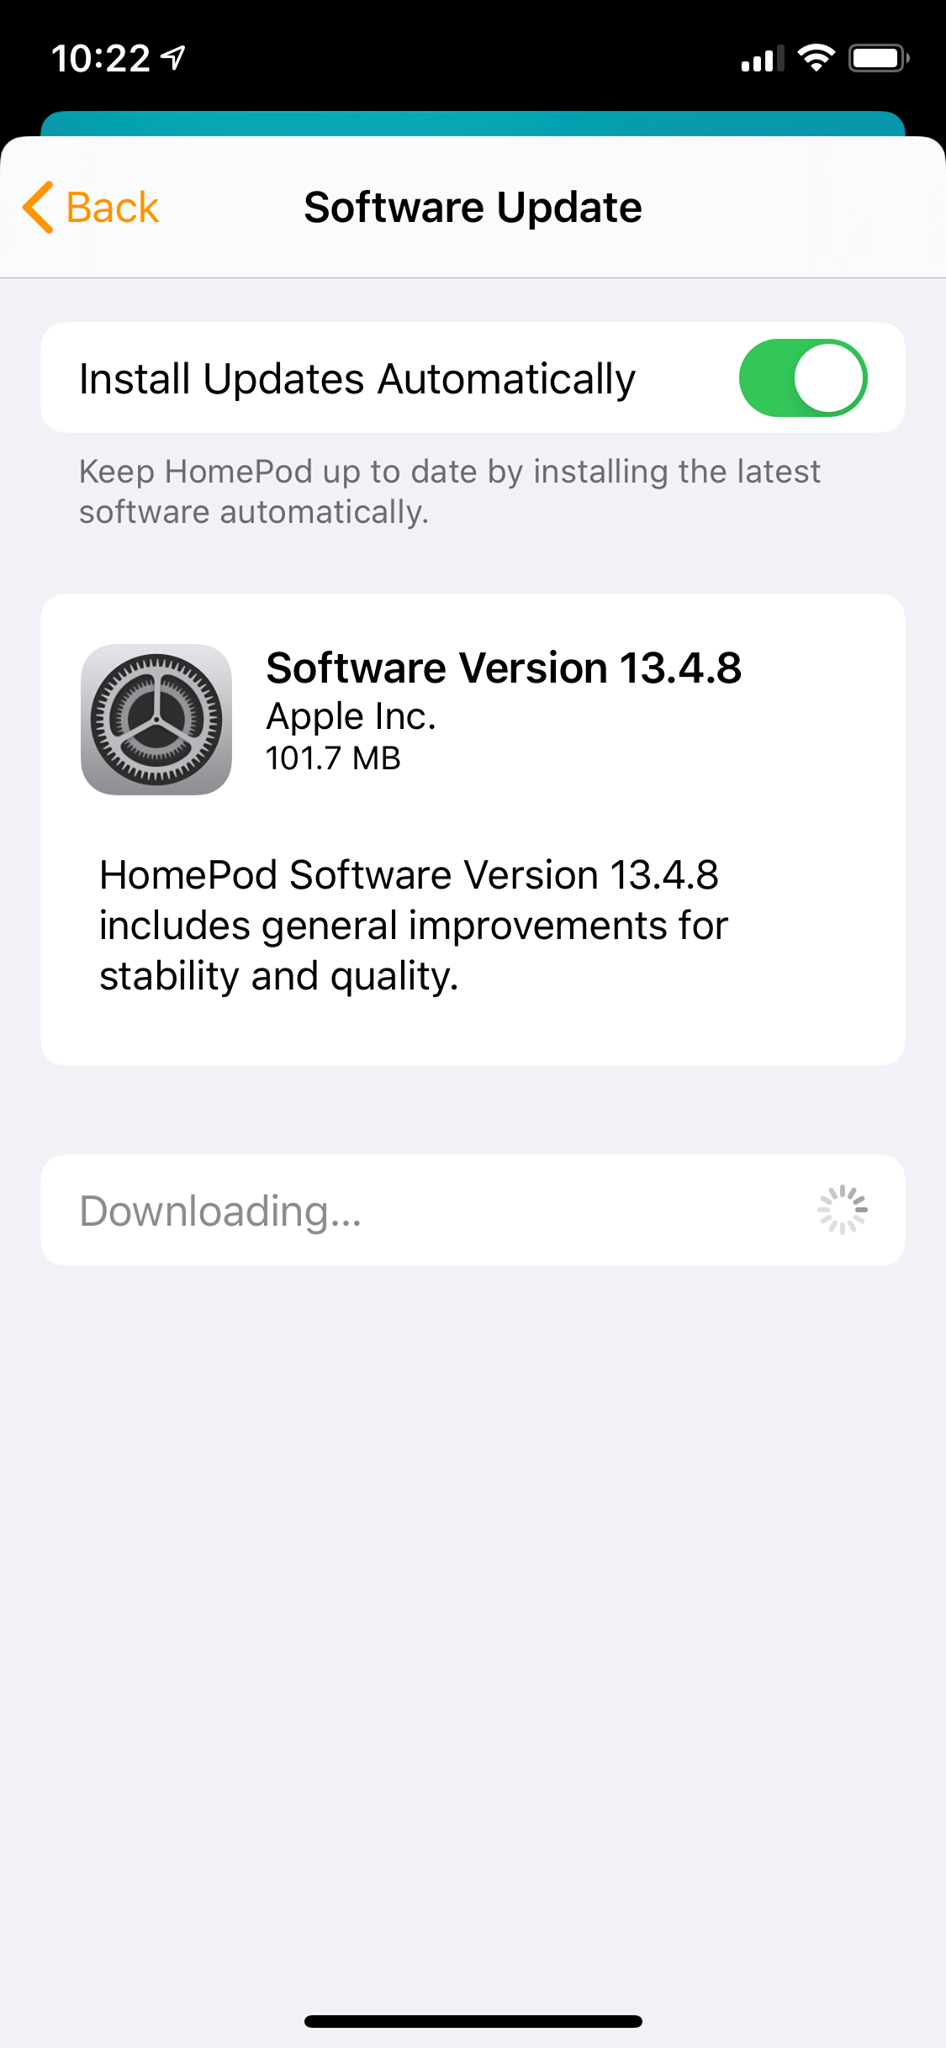 HomePod Software Version 13.4.8